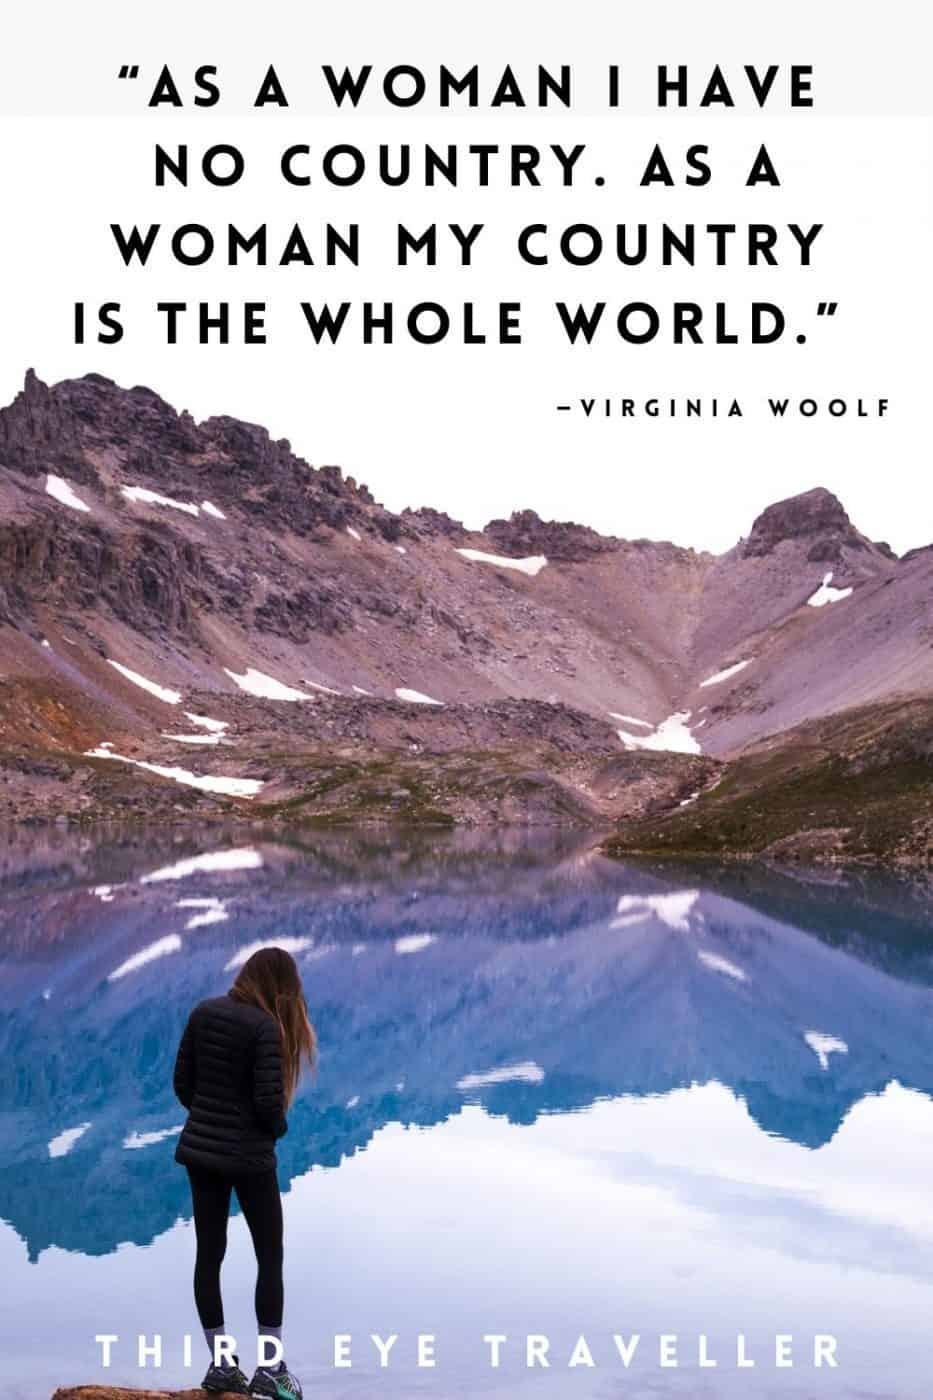 Solo female travel quotes